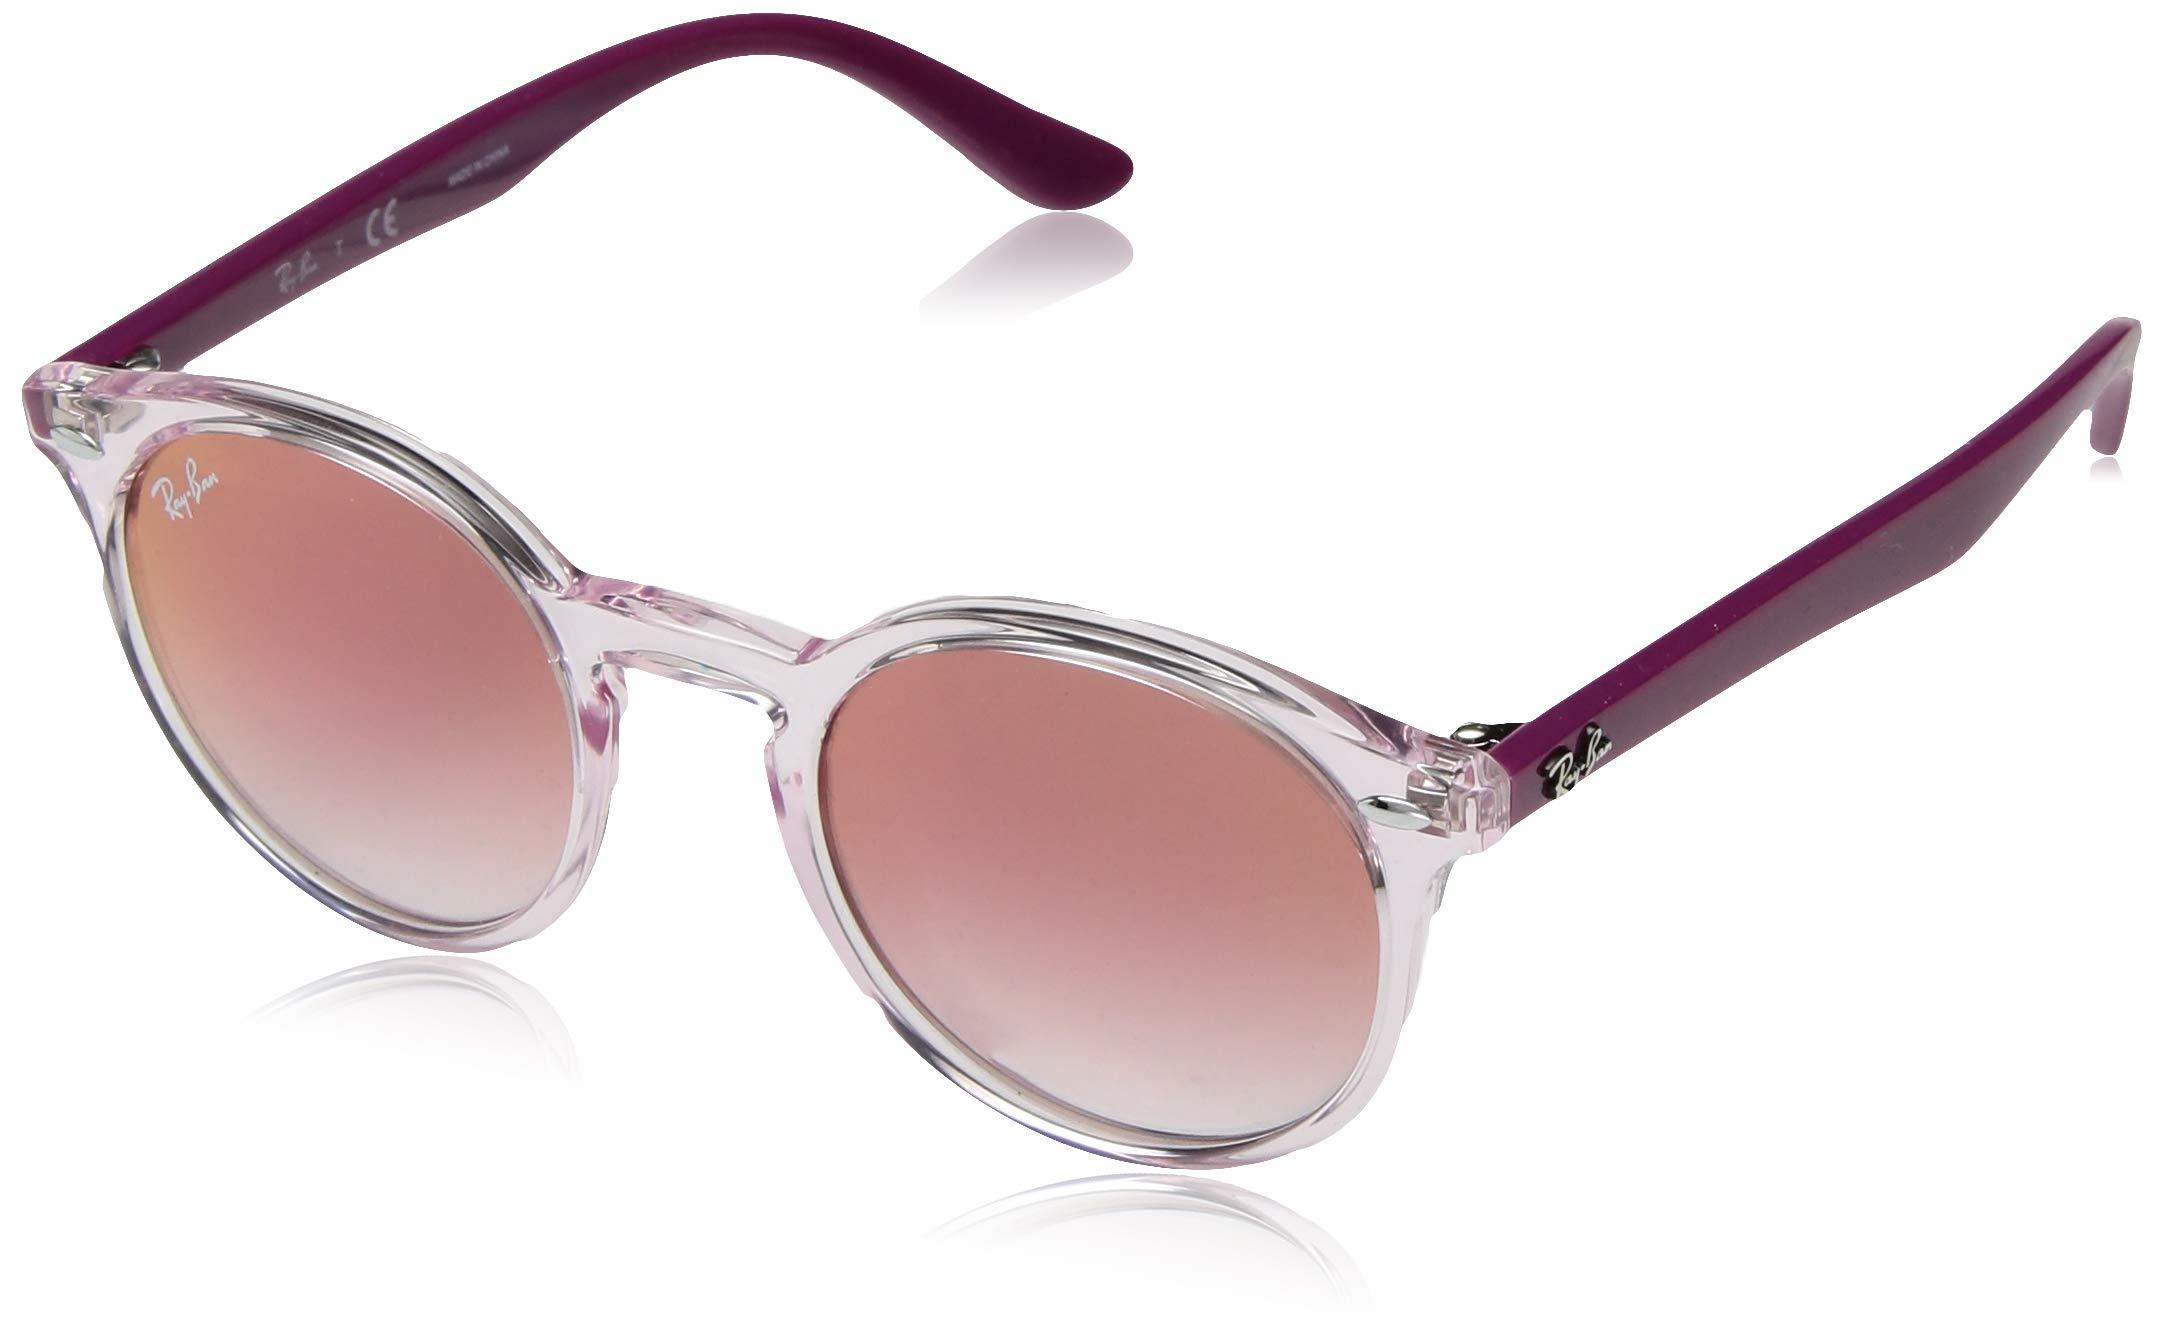 Ray-Ban Kids' 0rj9064s Round Sunglasses, Transparent Pink, 44.1 mm